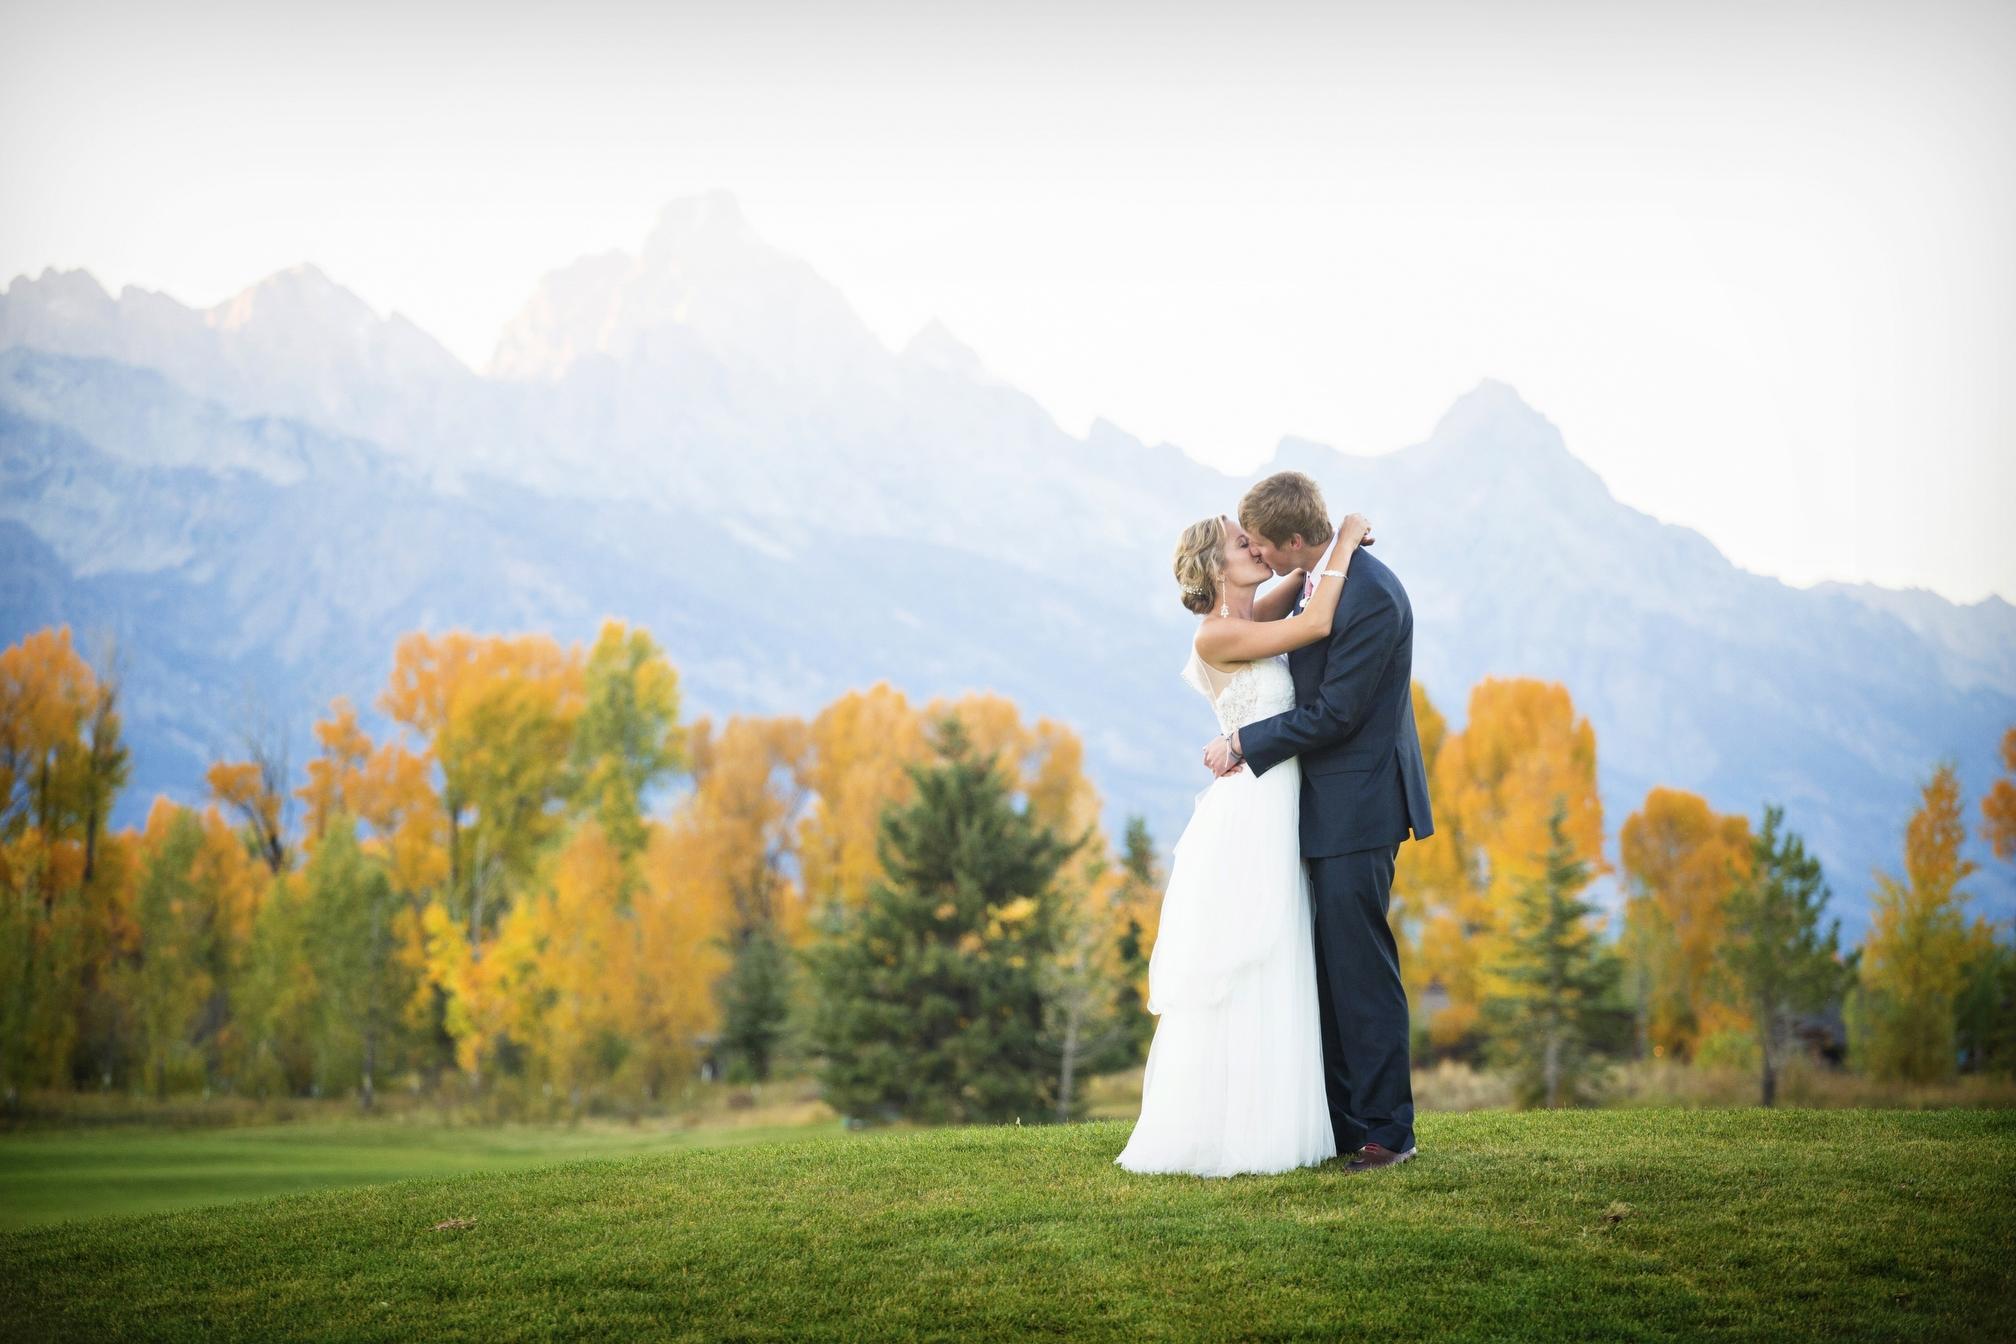 Millett Wedding Jackson Hole 2104_0423A.JPG